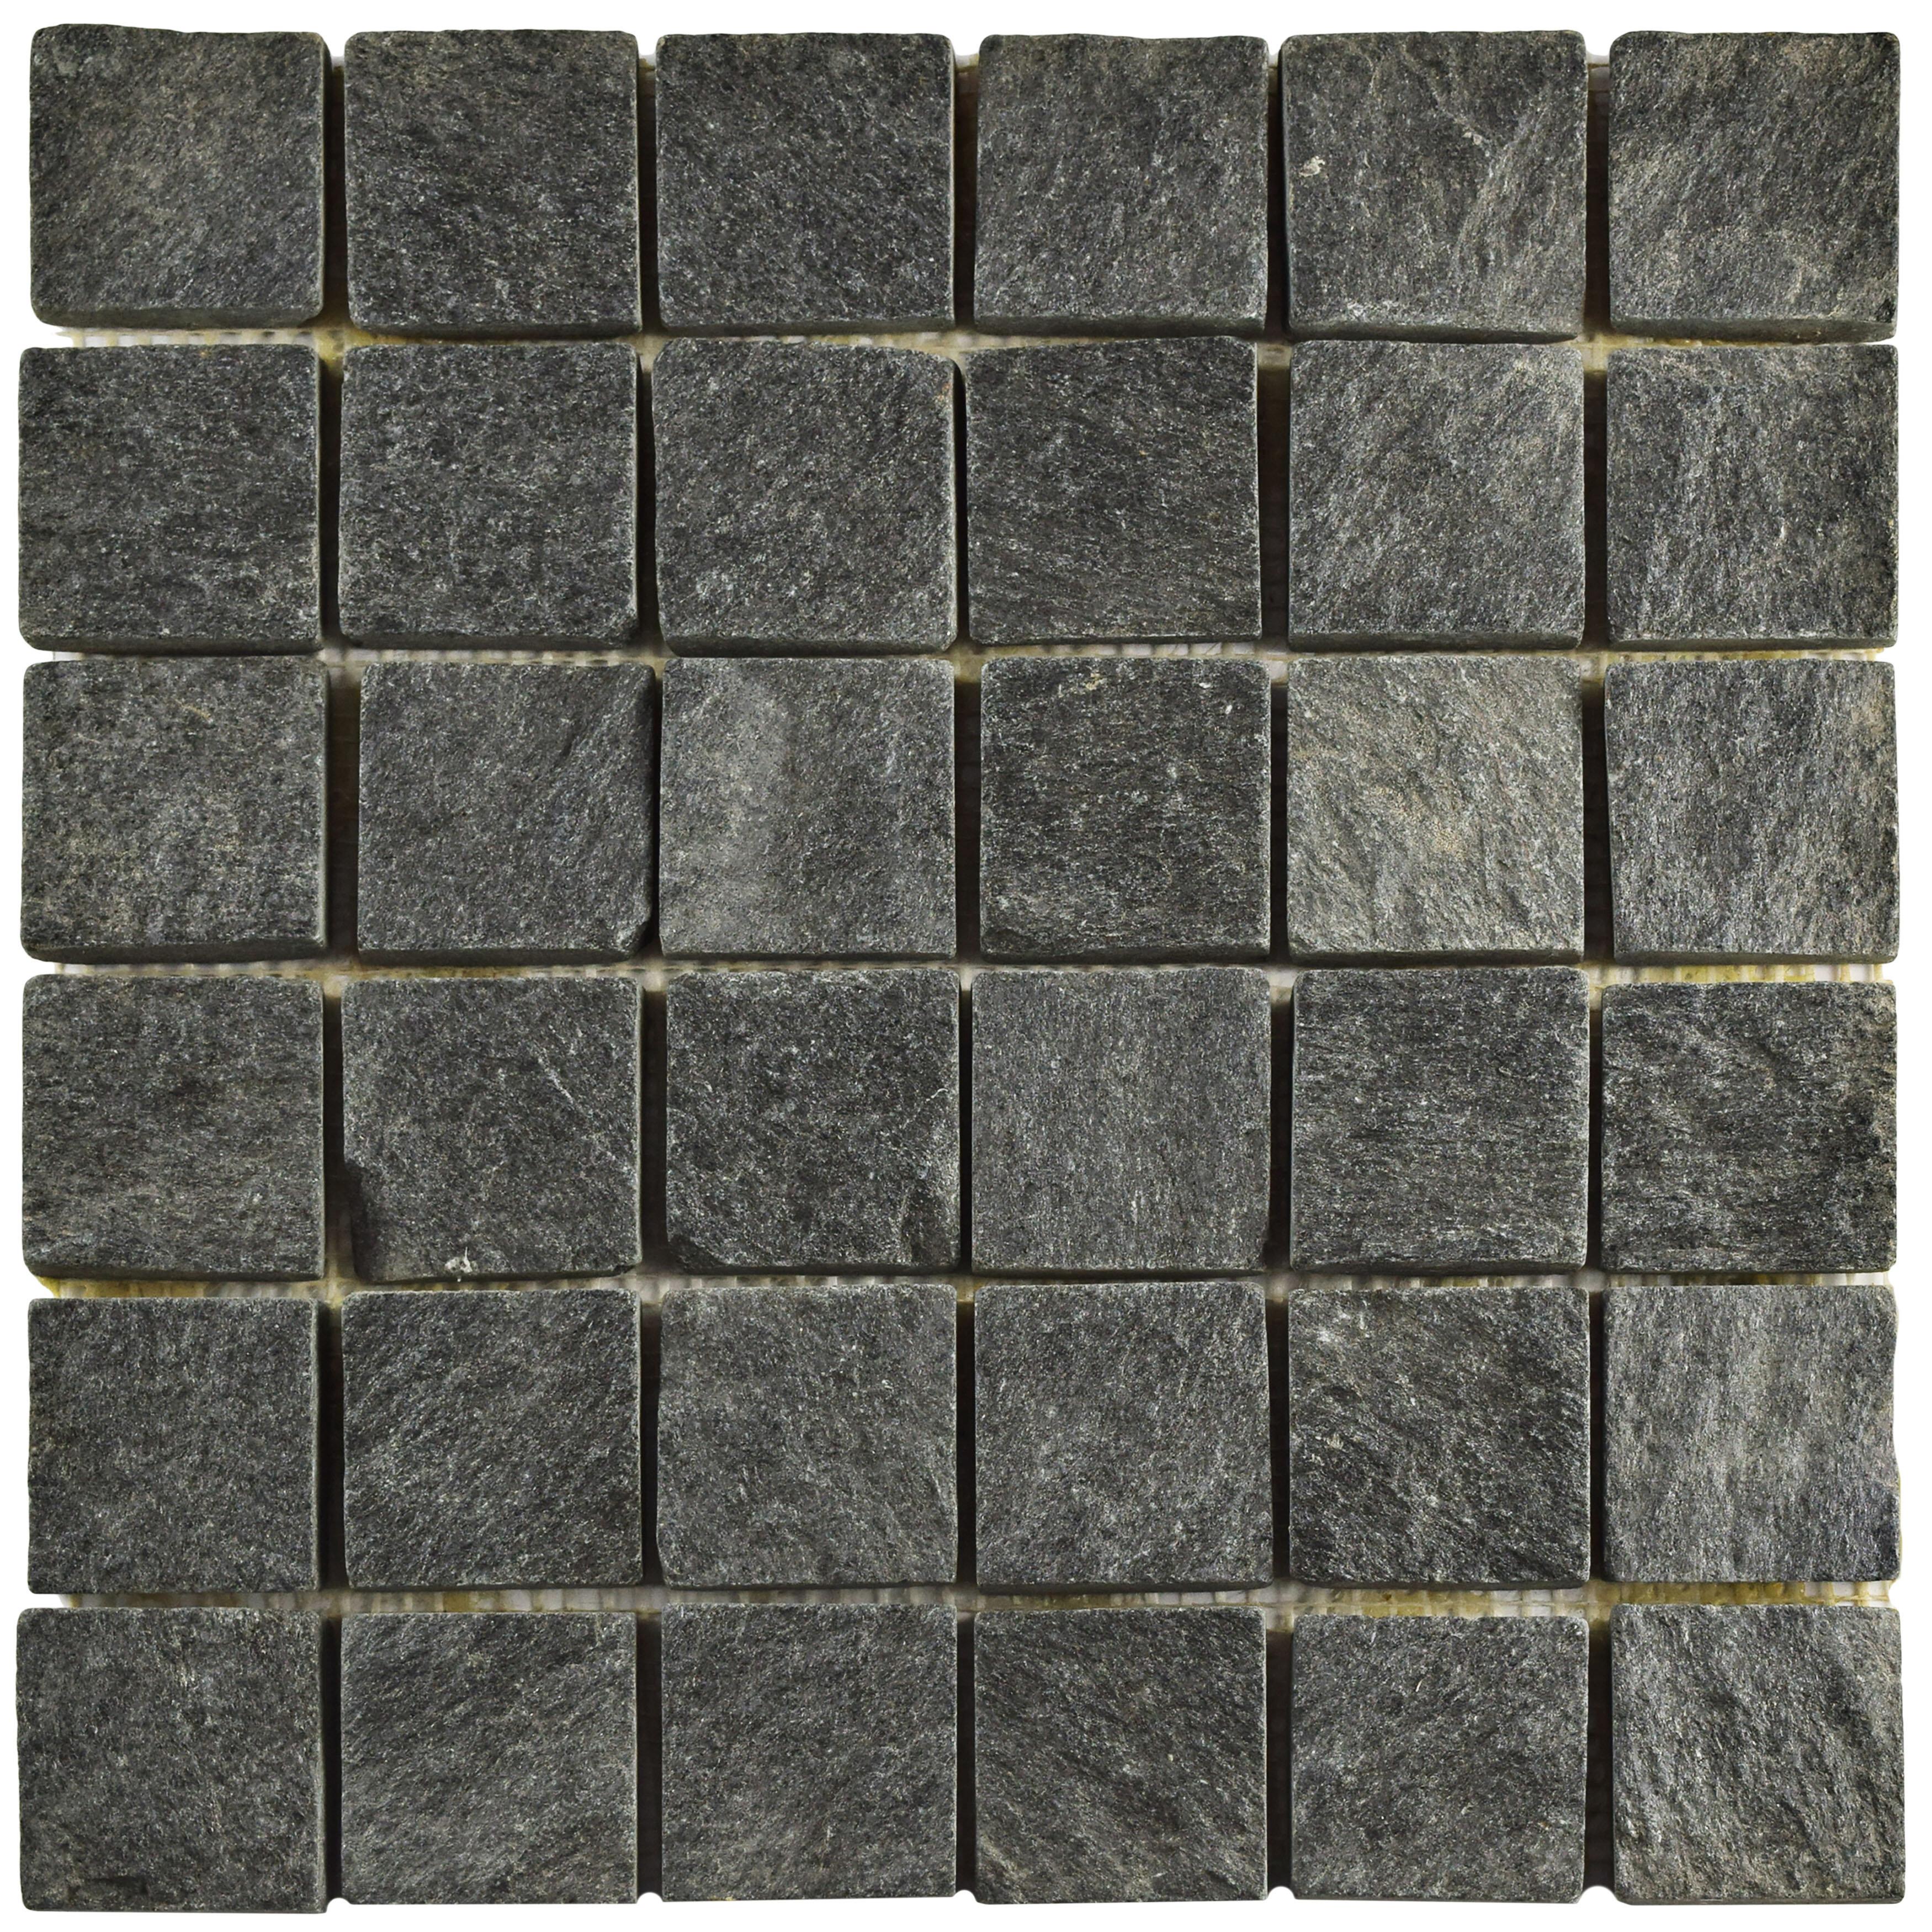 Elitetile Peak Quad Quartzite 1 88 X Slate Mosaic Tile In Black Reviews Wayfair